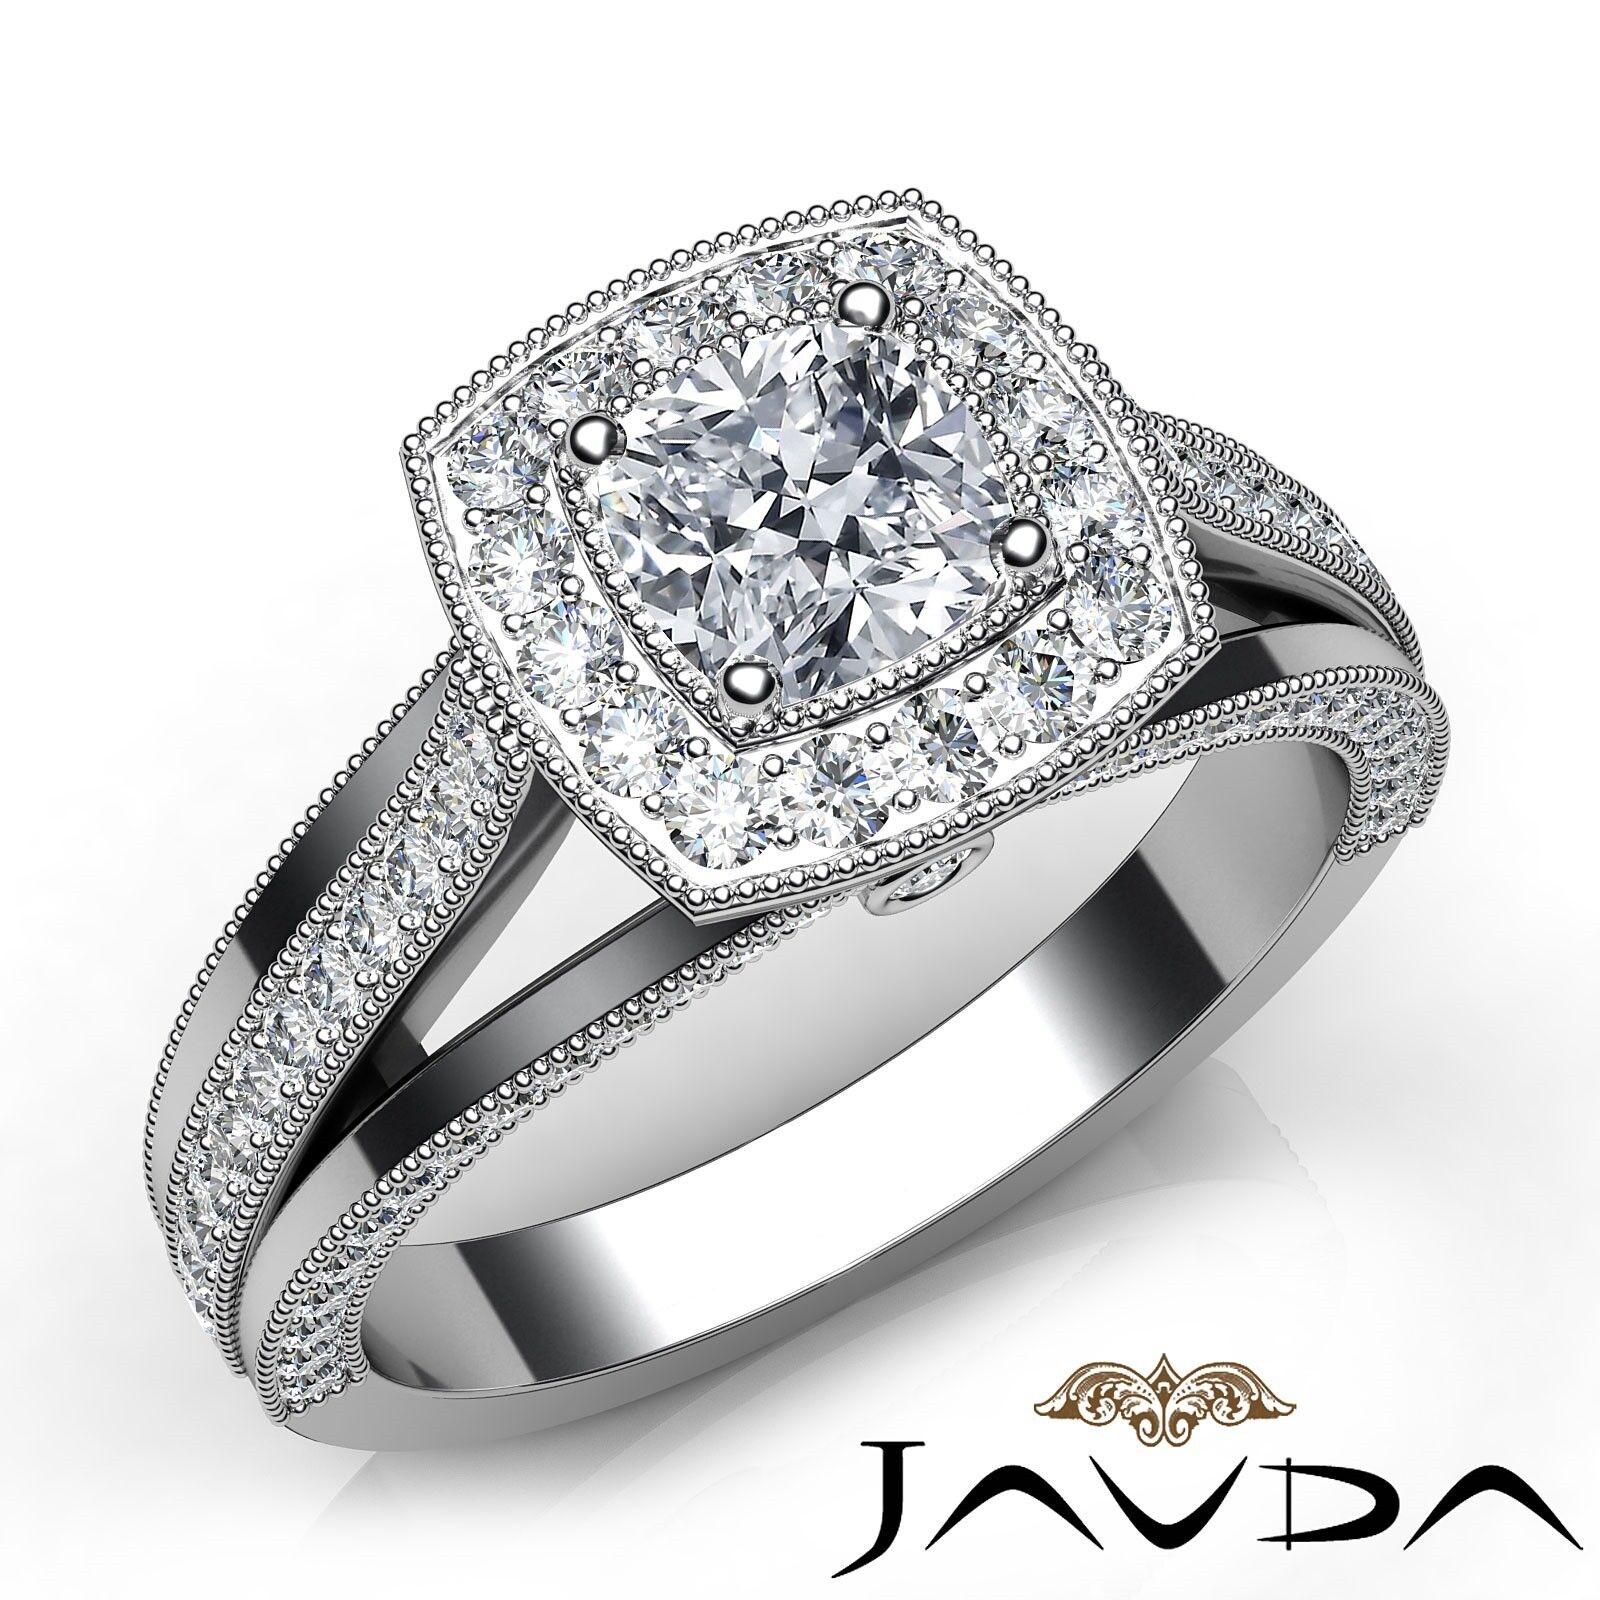 1.65ct Milgrain Halo Bezel Cushion Diamond Engagement Ring GIA F-VVS1 White Gold